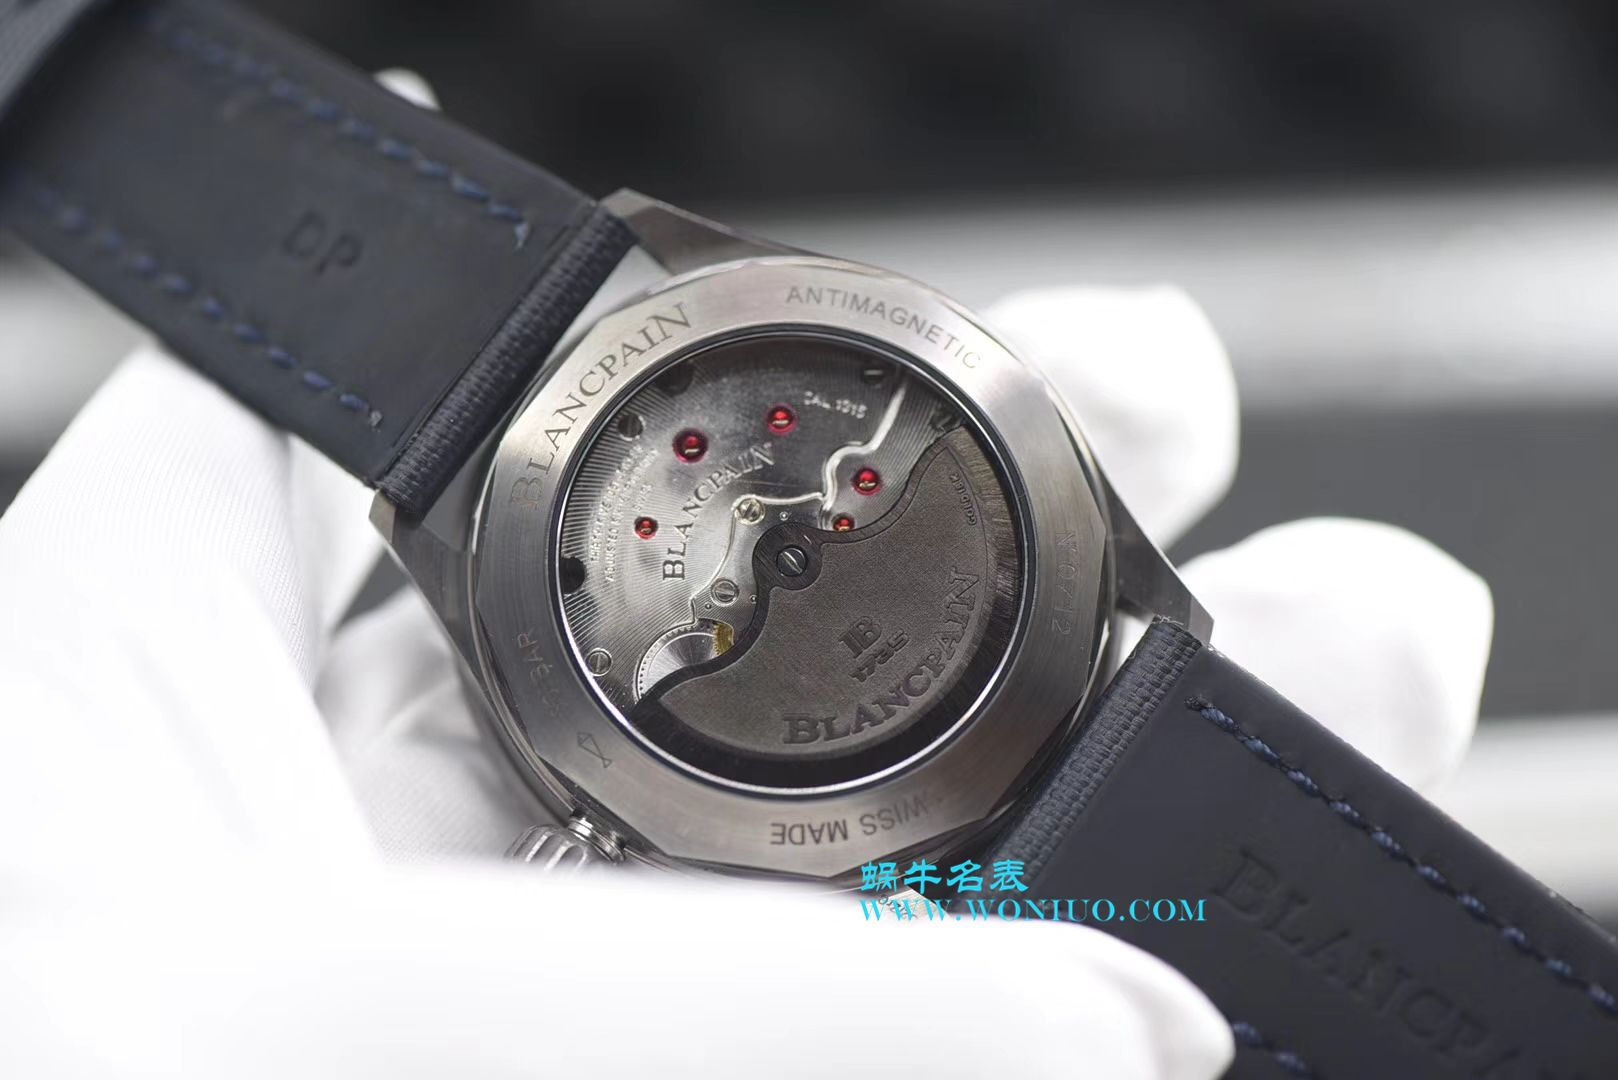 【ZF厂顶级复刻手表】宝珀五十噚系列5000-0240-O52A腕表 / BP051